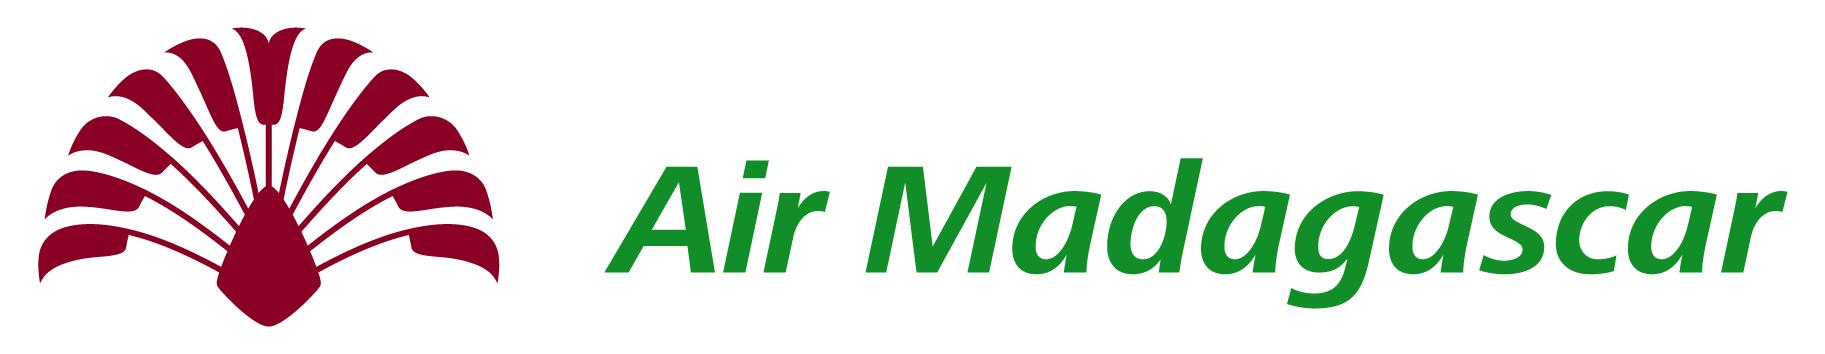 Partenaire RNS : Air Madagascarr